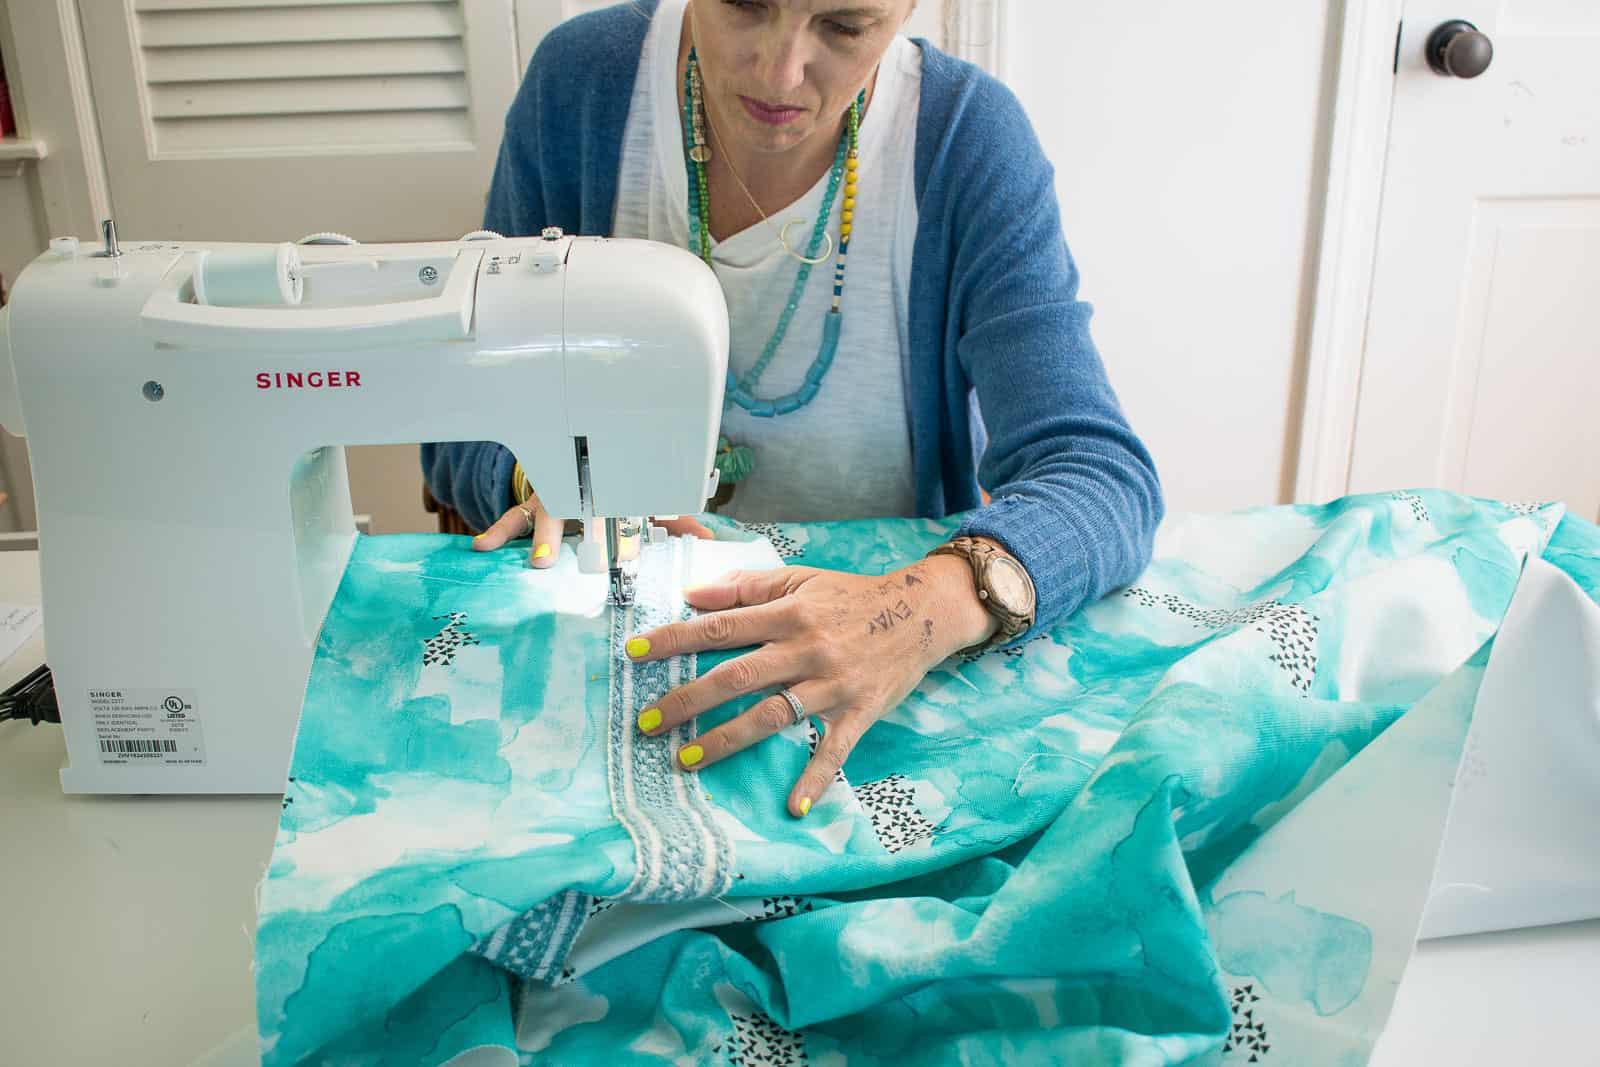 sewing trim onto fabric